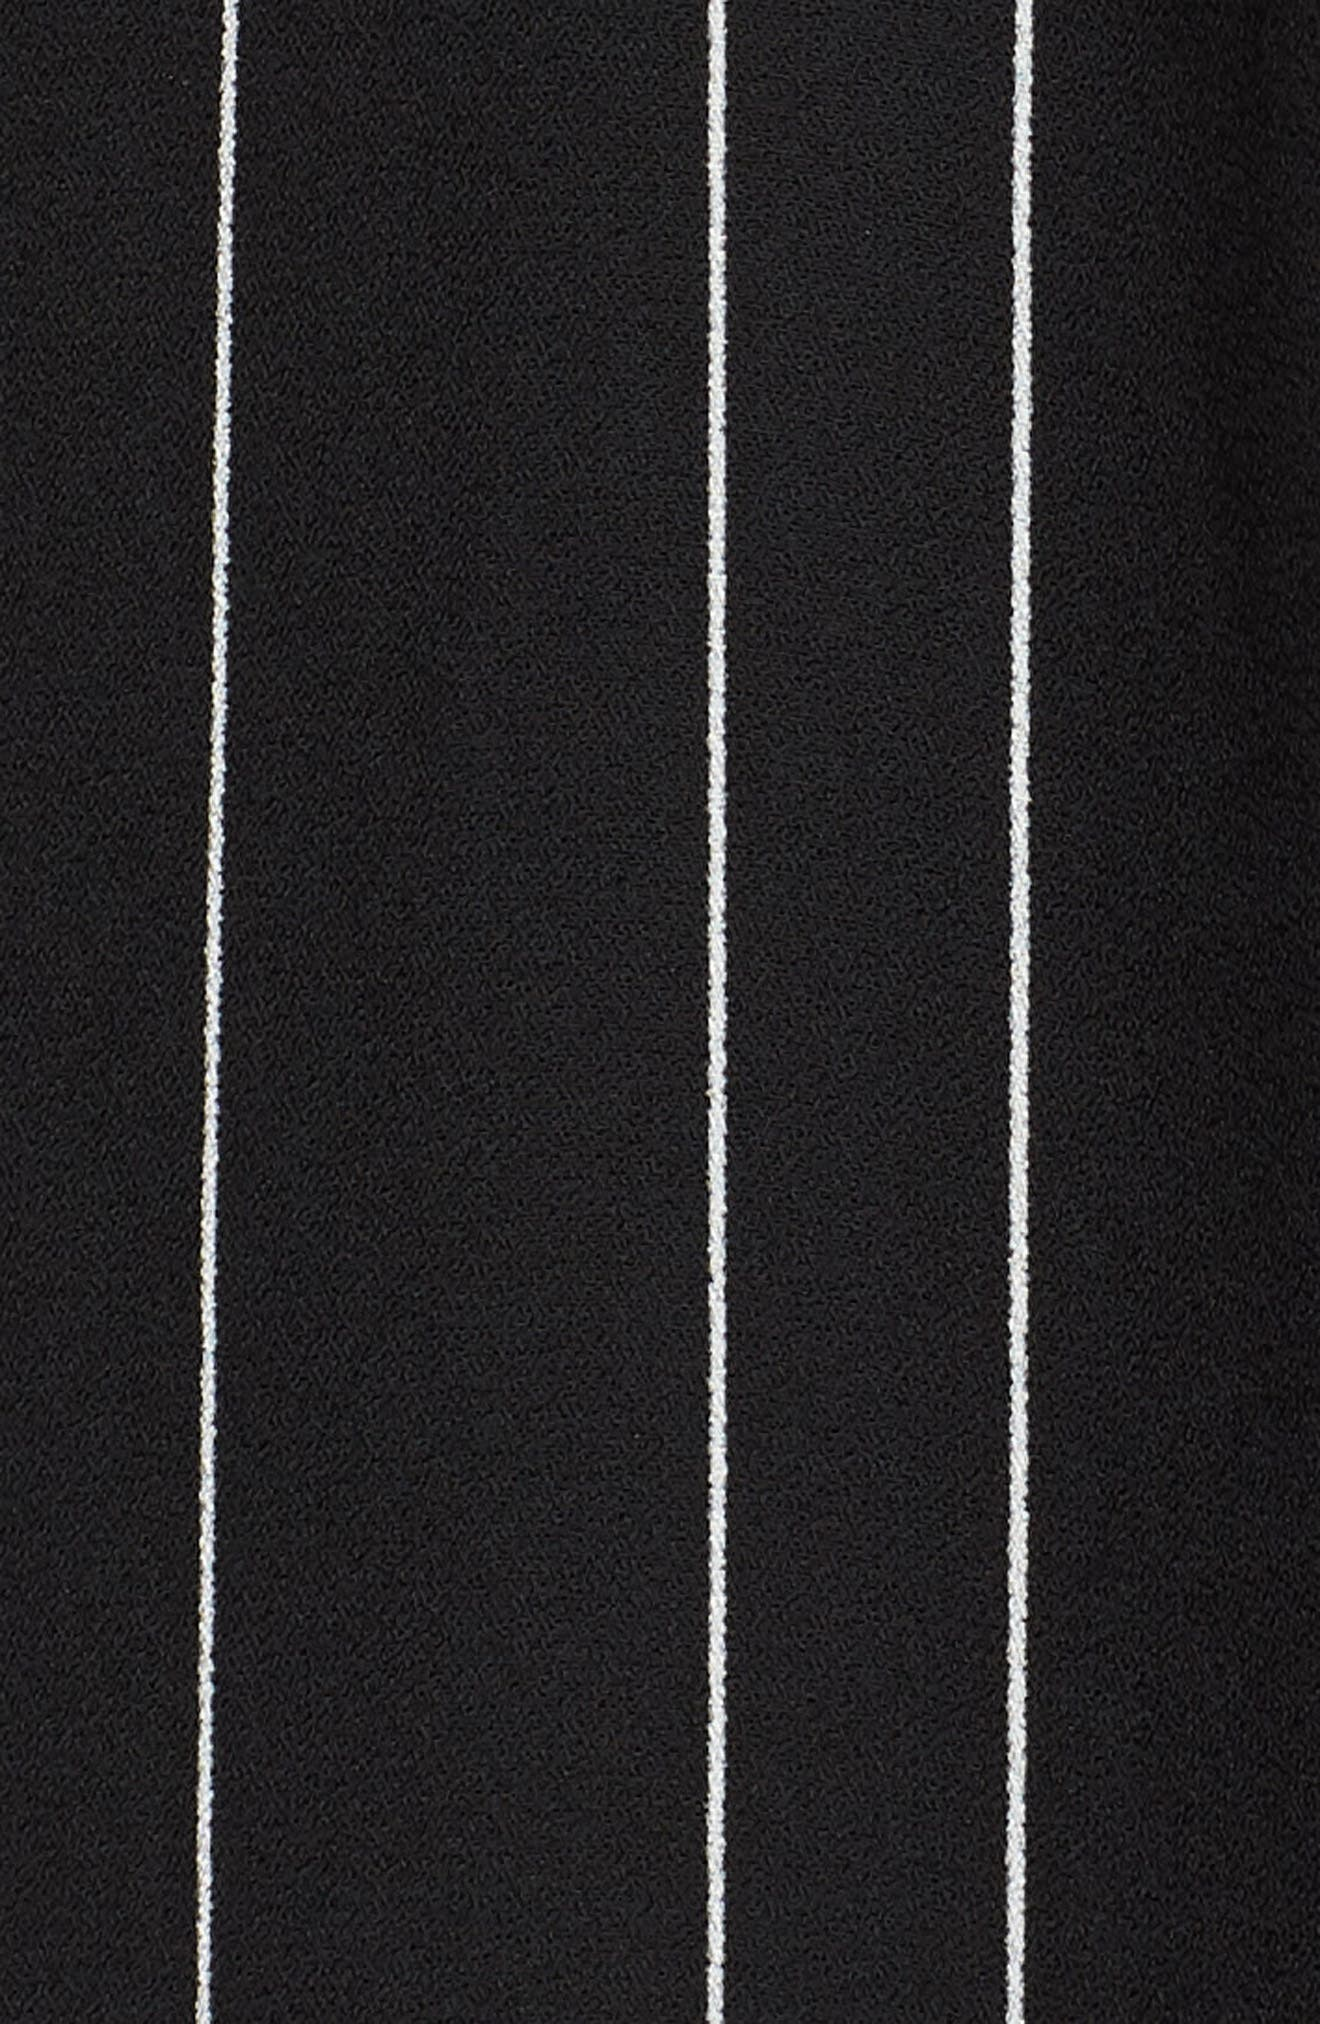 Dolman Sleeve Jumpsuit,                             Alternate thumbnail 6, color,                             BLACK TRACY STRIPE